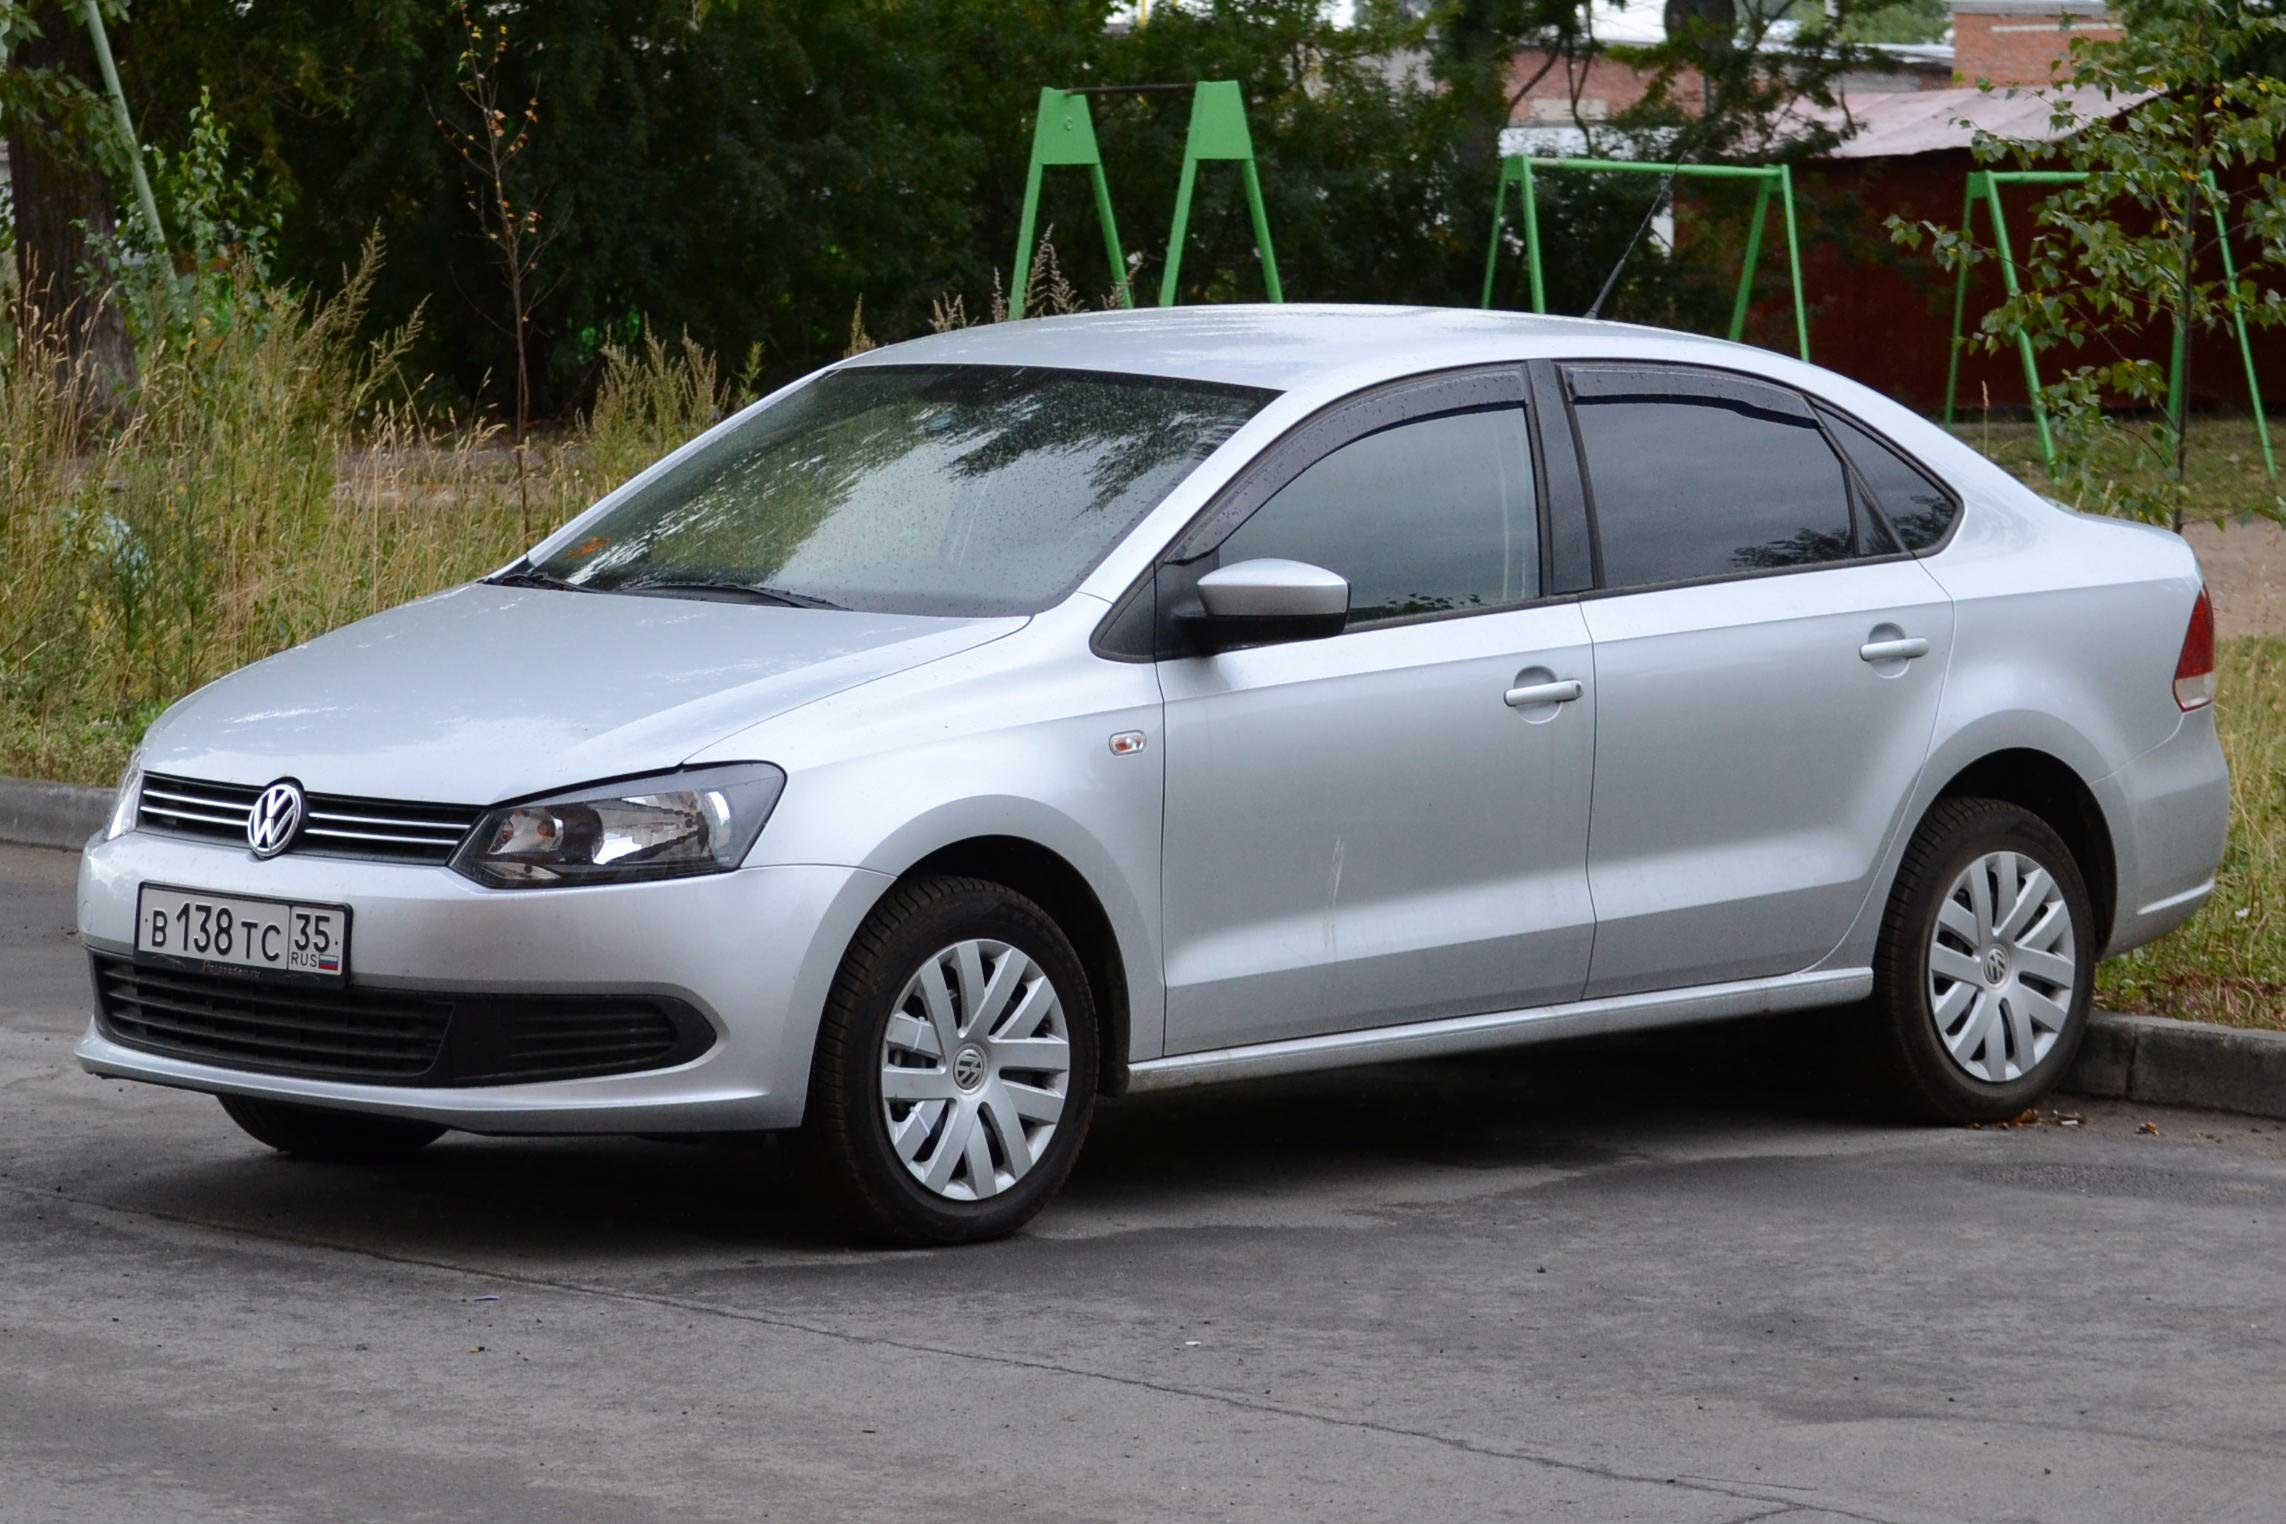 Volkswagen Polo Sedan 2